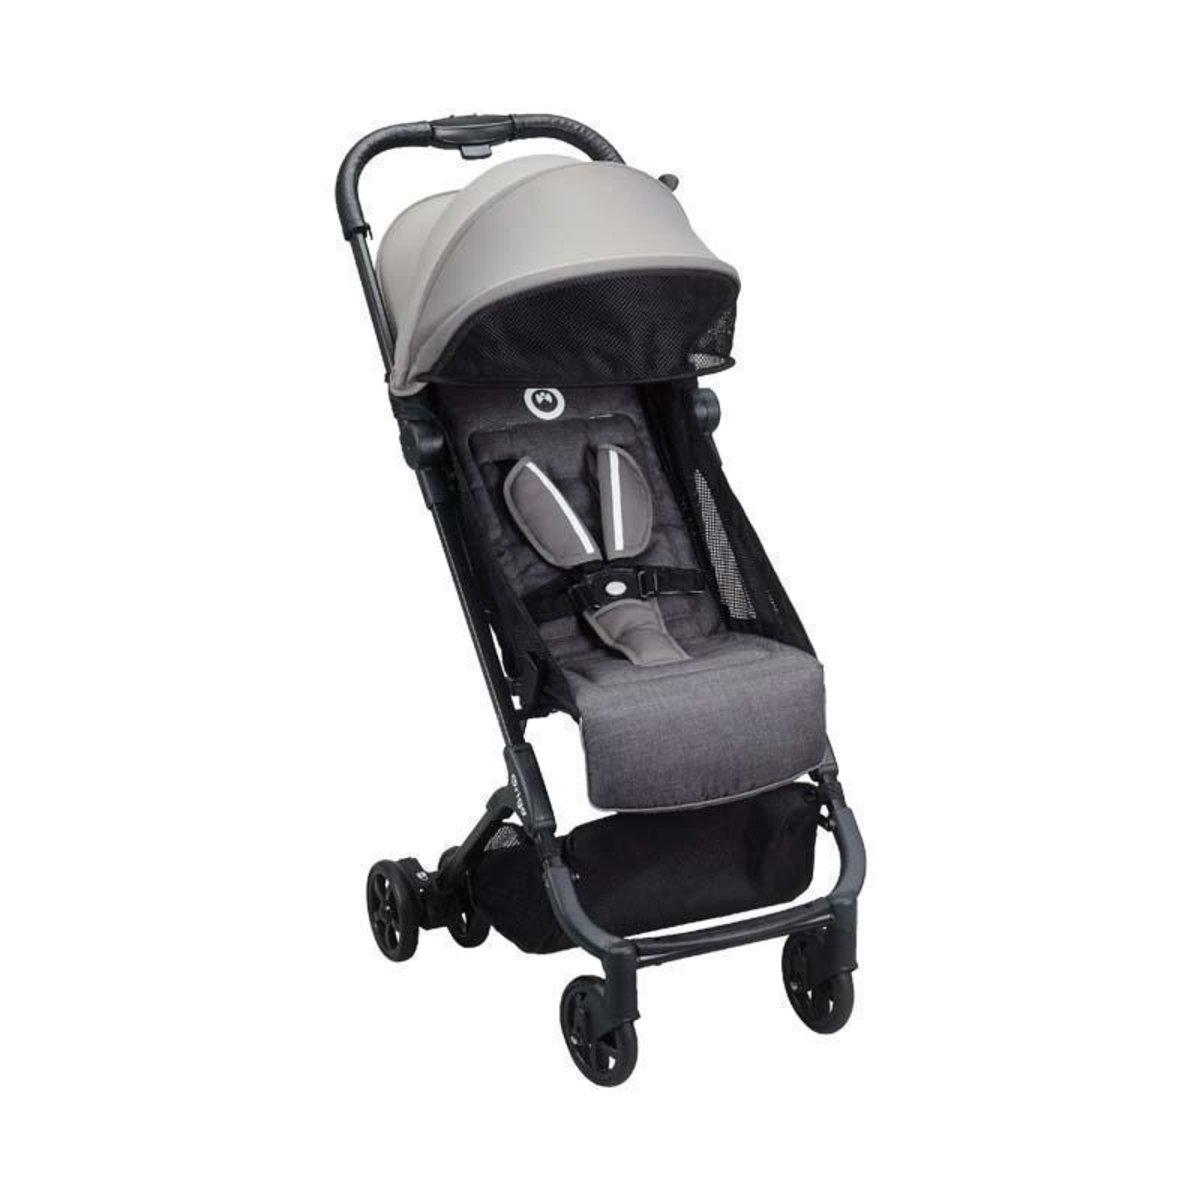 Bubble 羽輕量摺疊嬰兒車 0-4歲 英國品牌 - 石墨灰